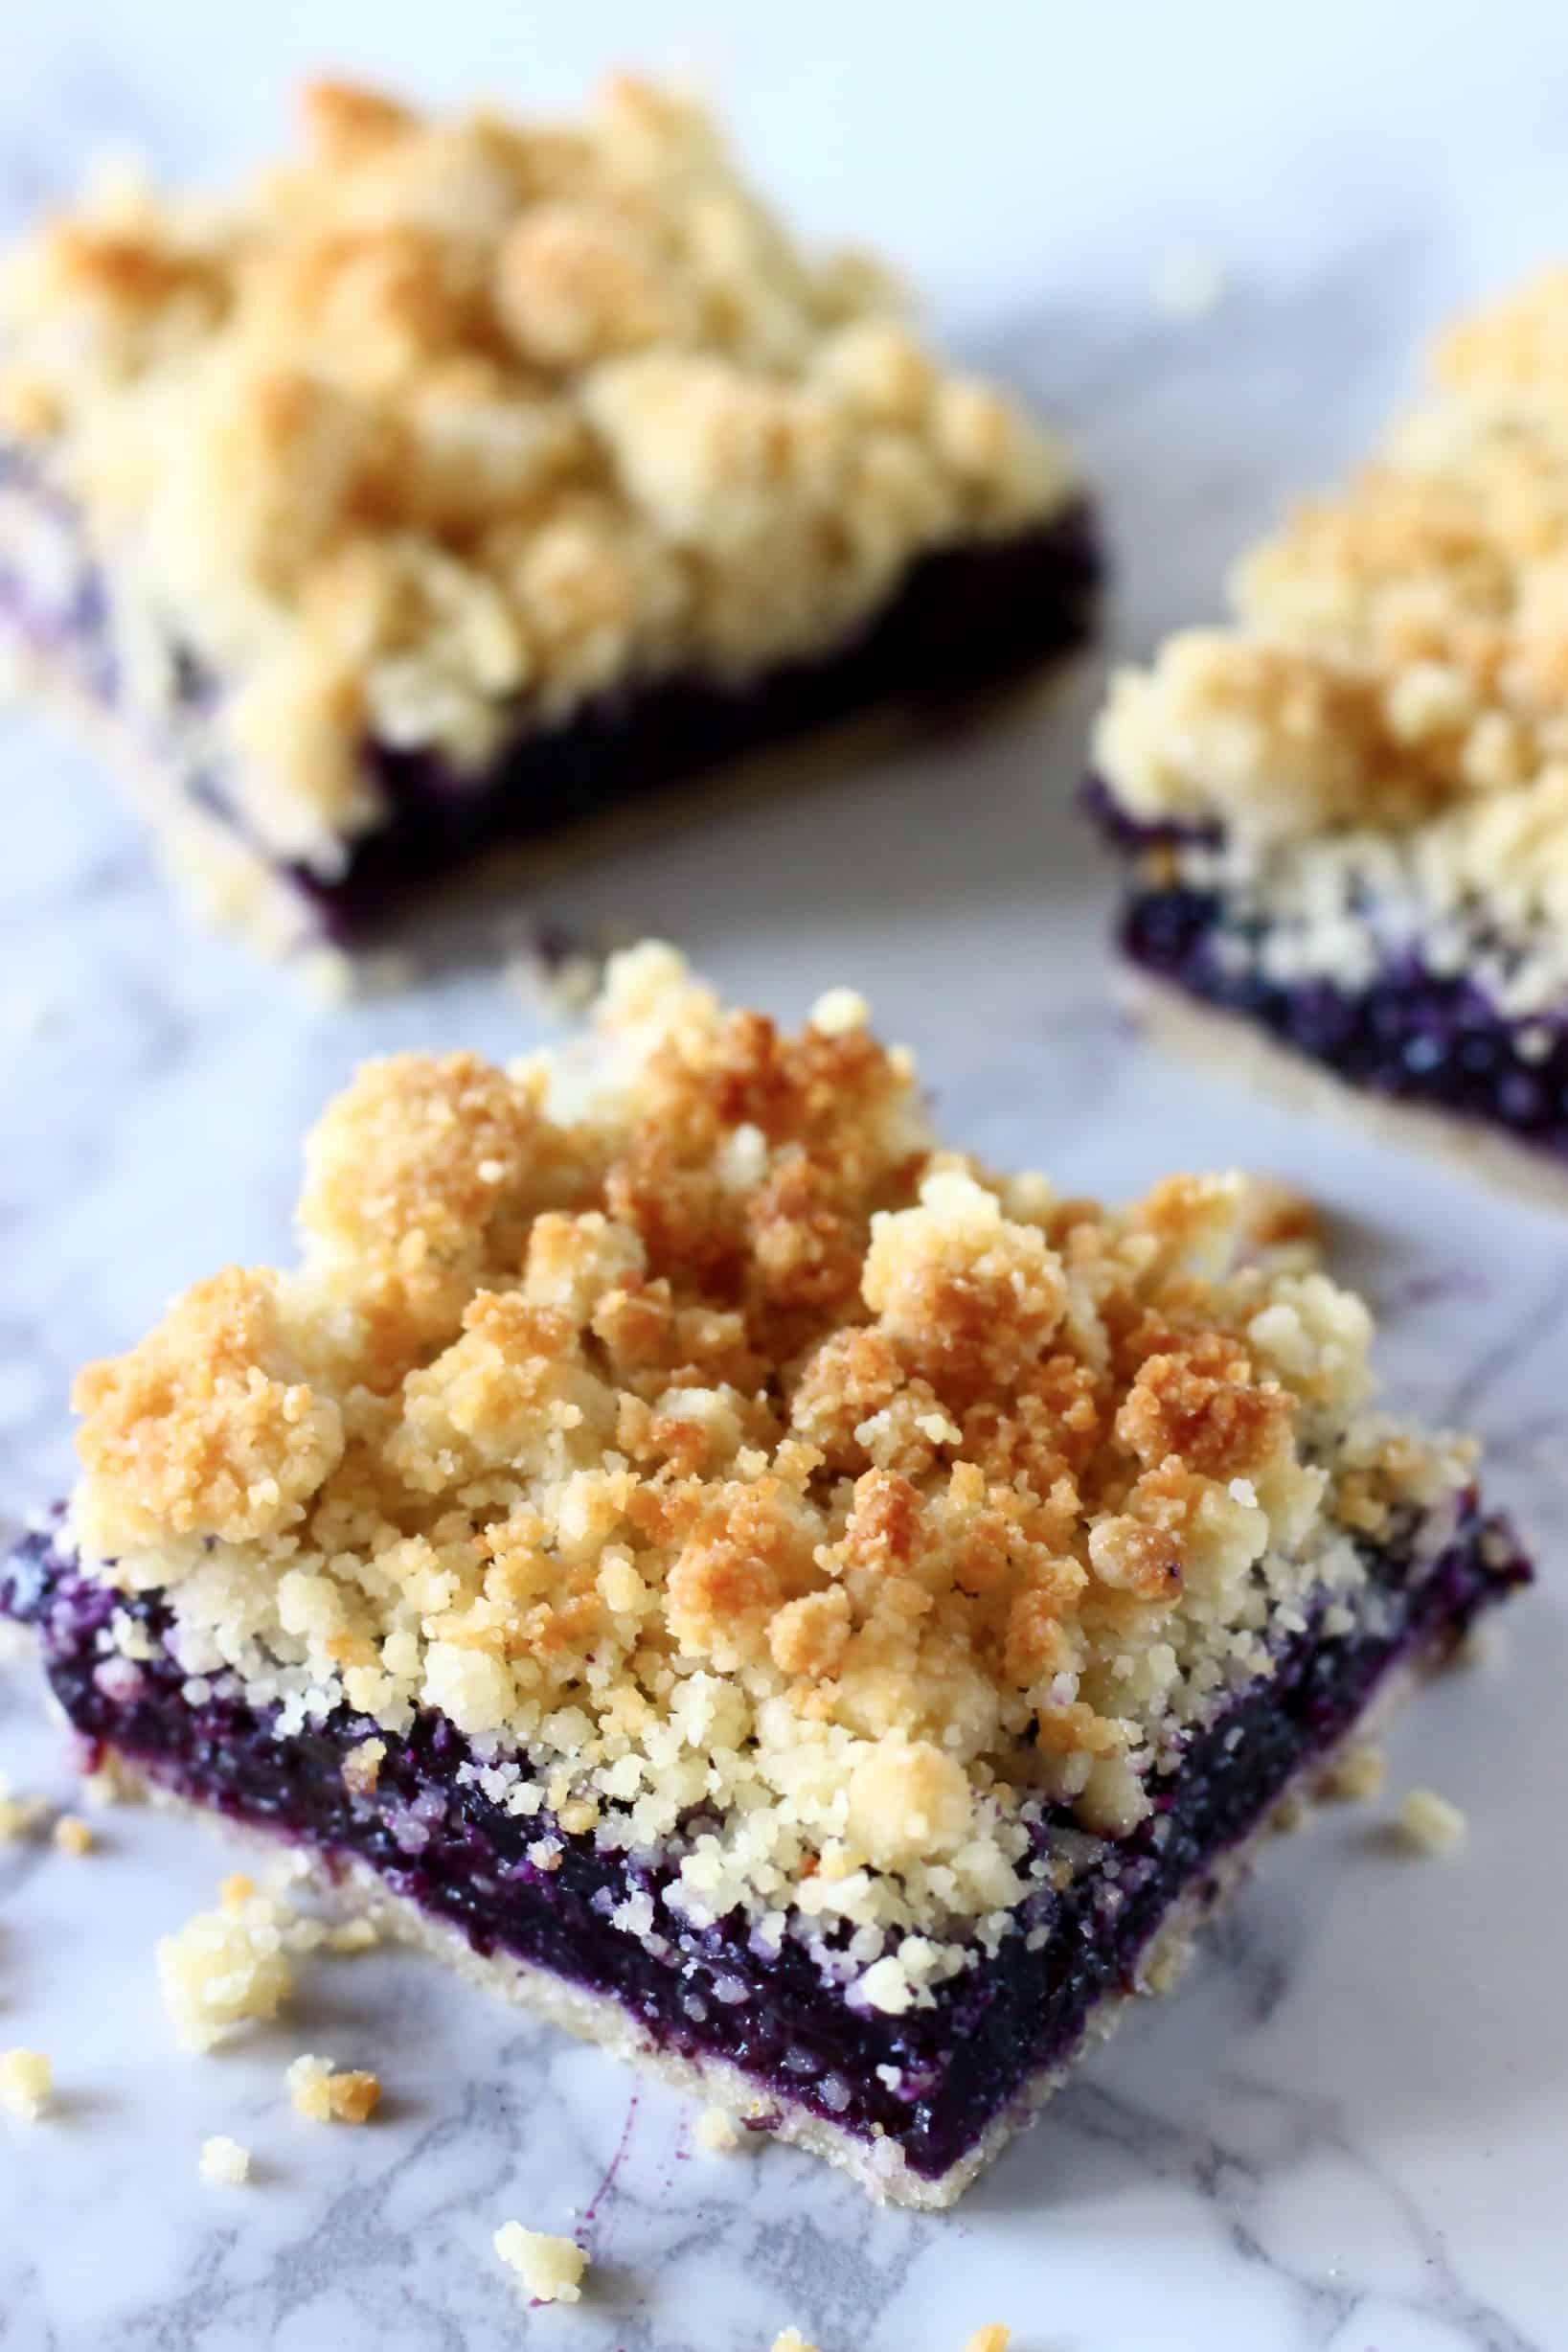 Three gluten-free vegan blueberry crumble bar squares